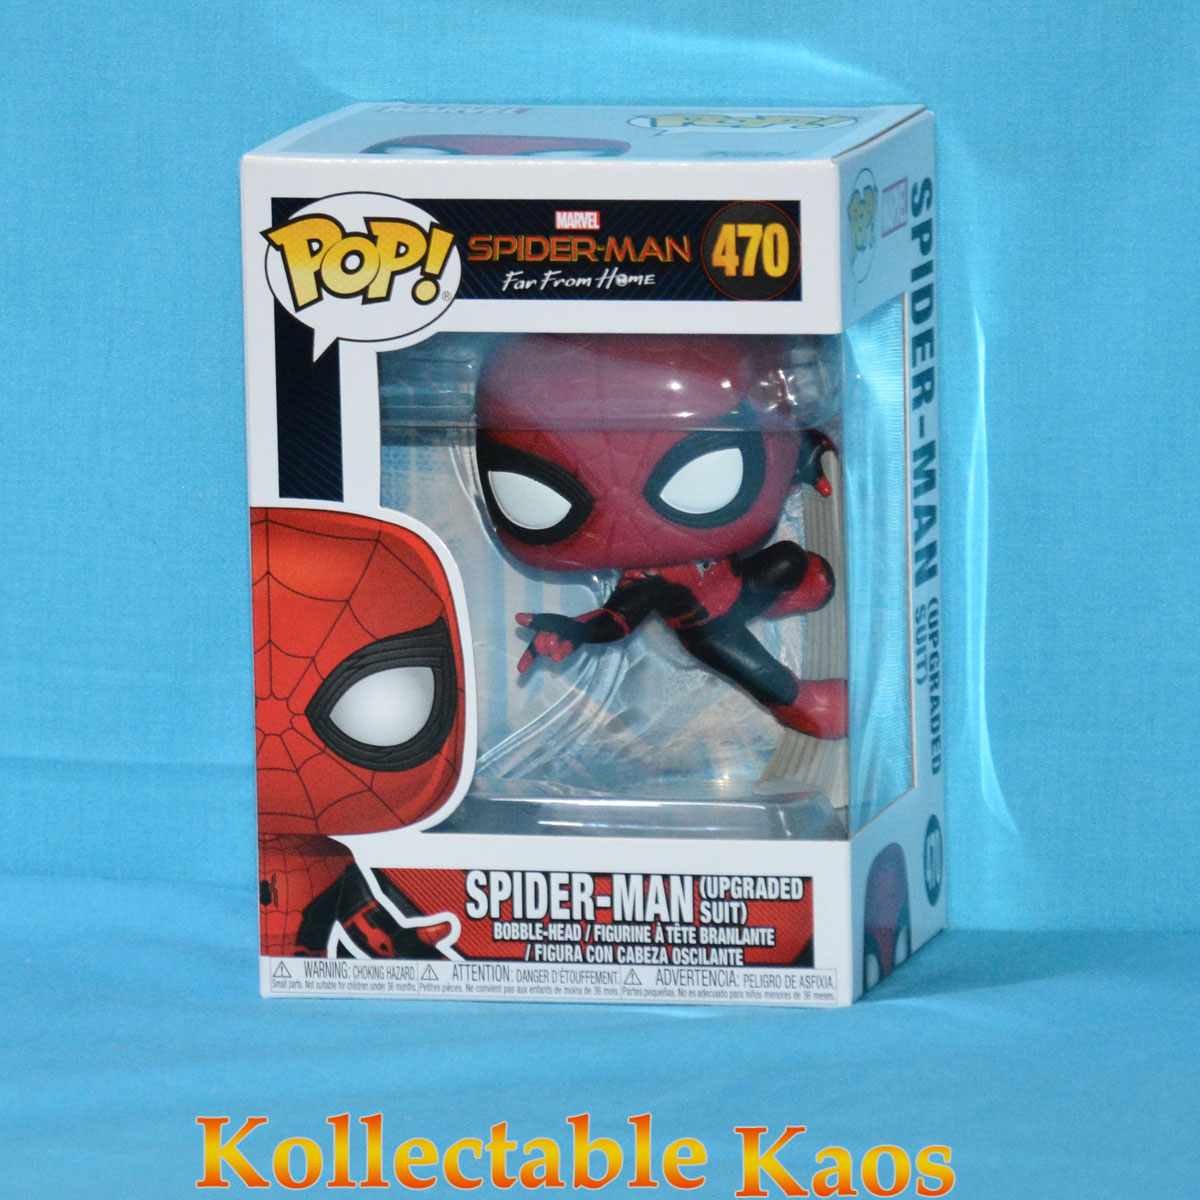 Spider-Man: Far From Home - Spider-Man Wall Crawl Pop! Vinyl Figure #470